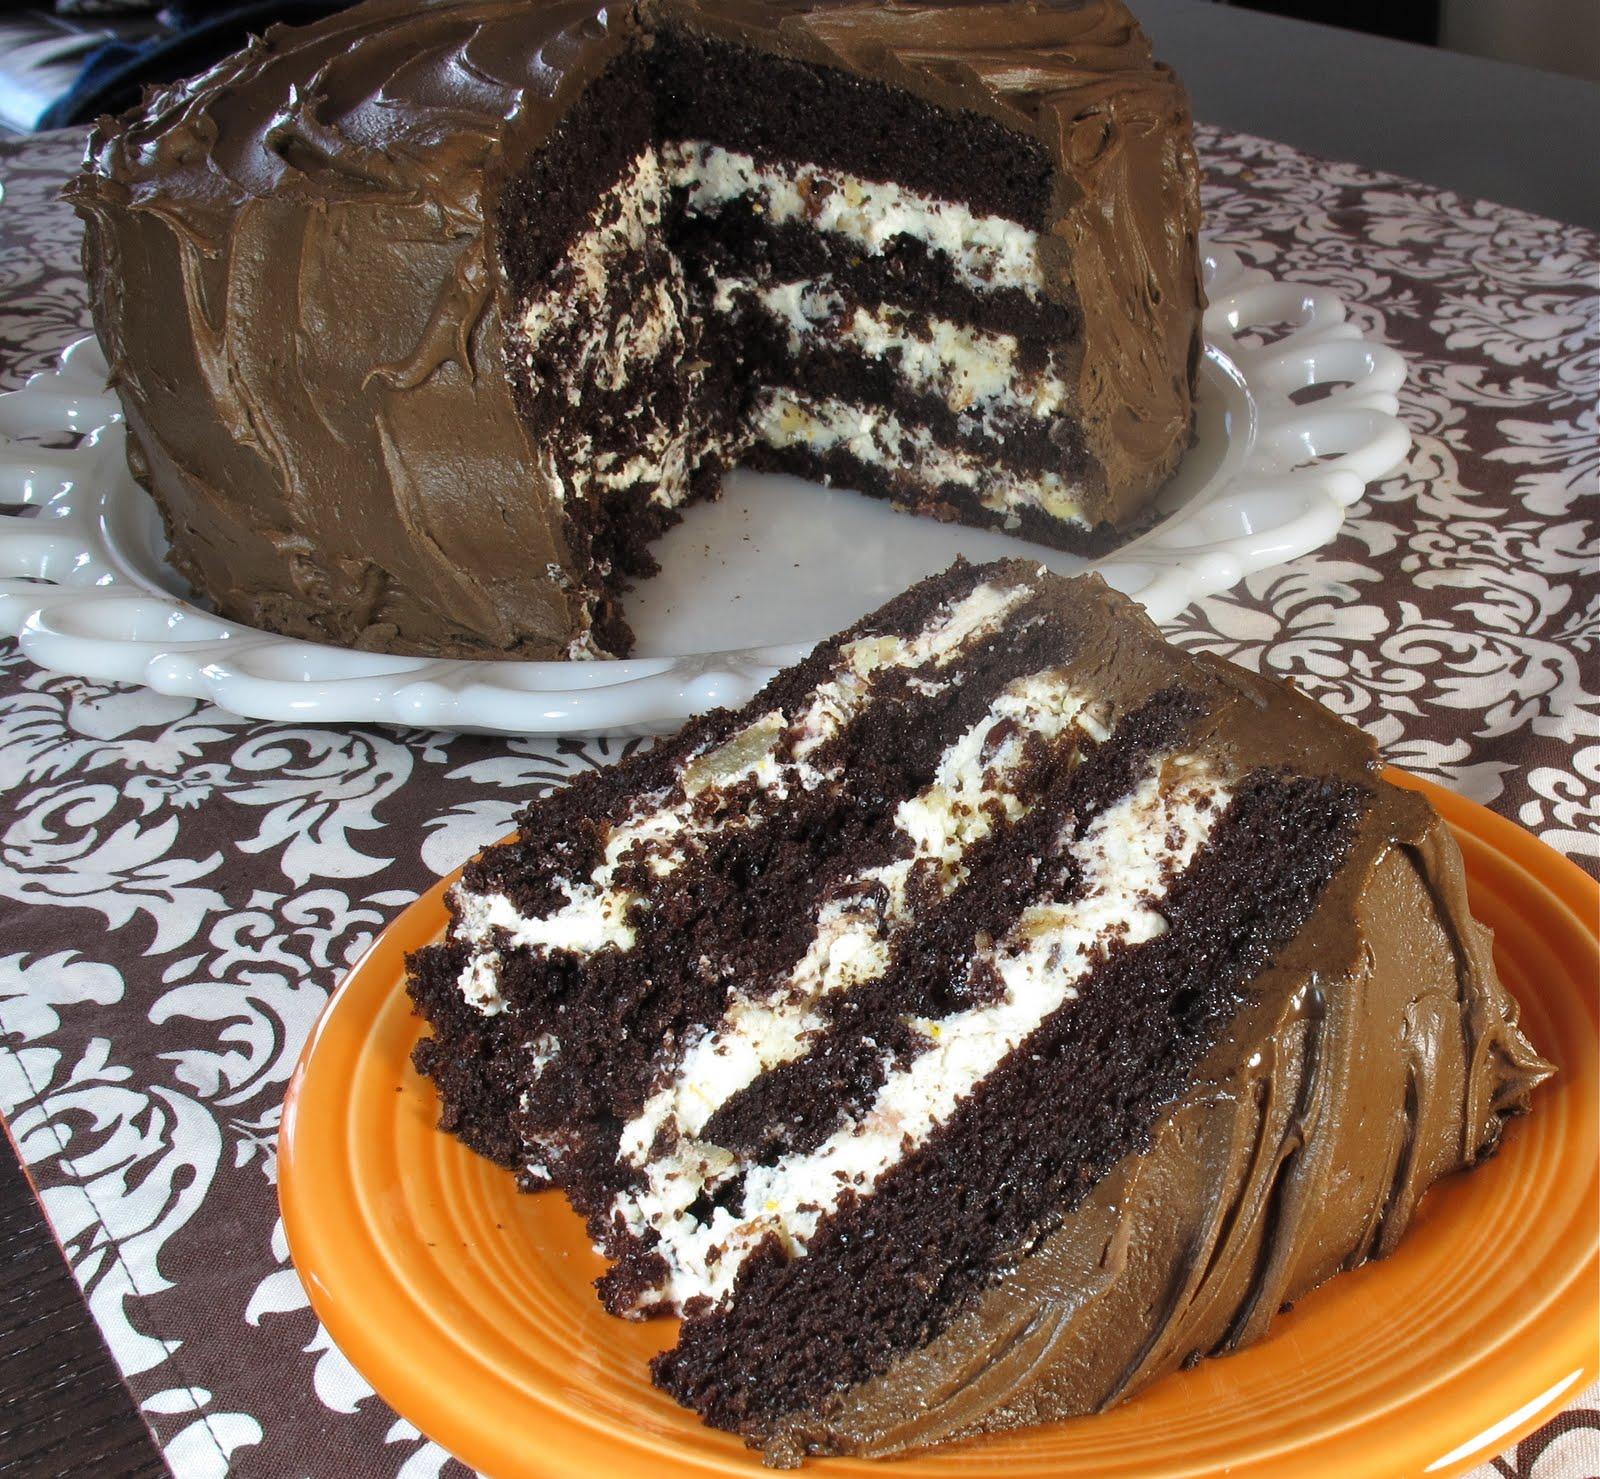 BluKatKraft: Recipe: Easy Quick Fix Ricotta Cake